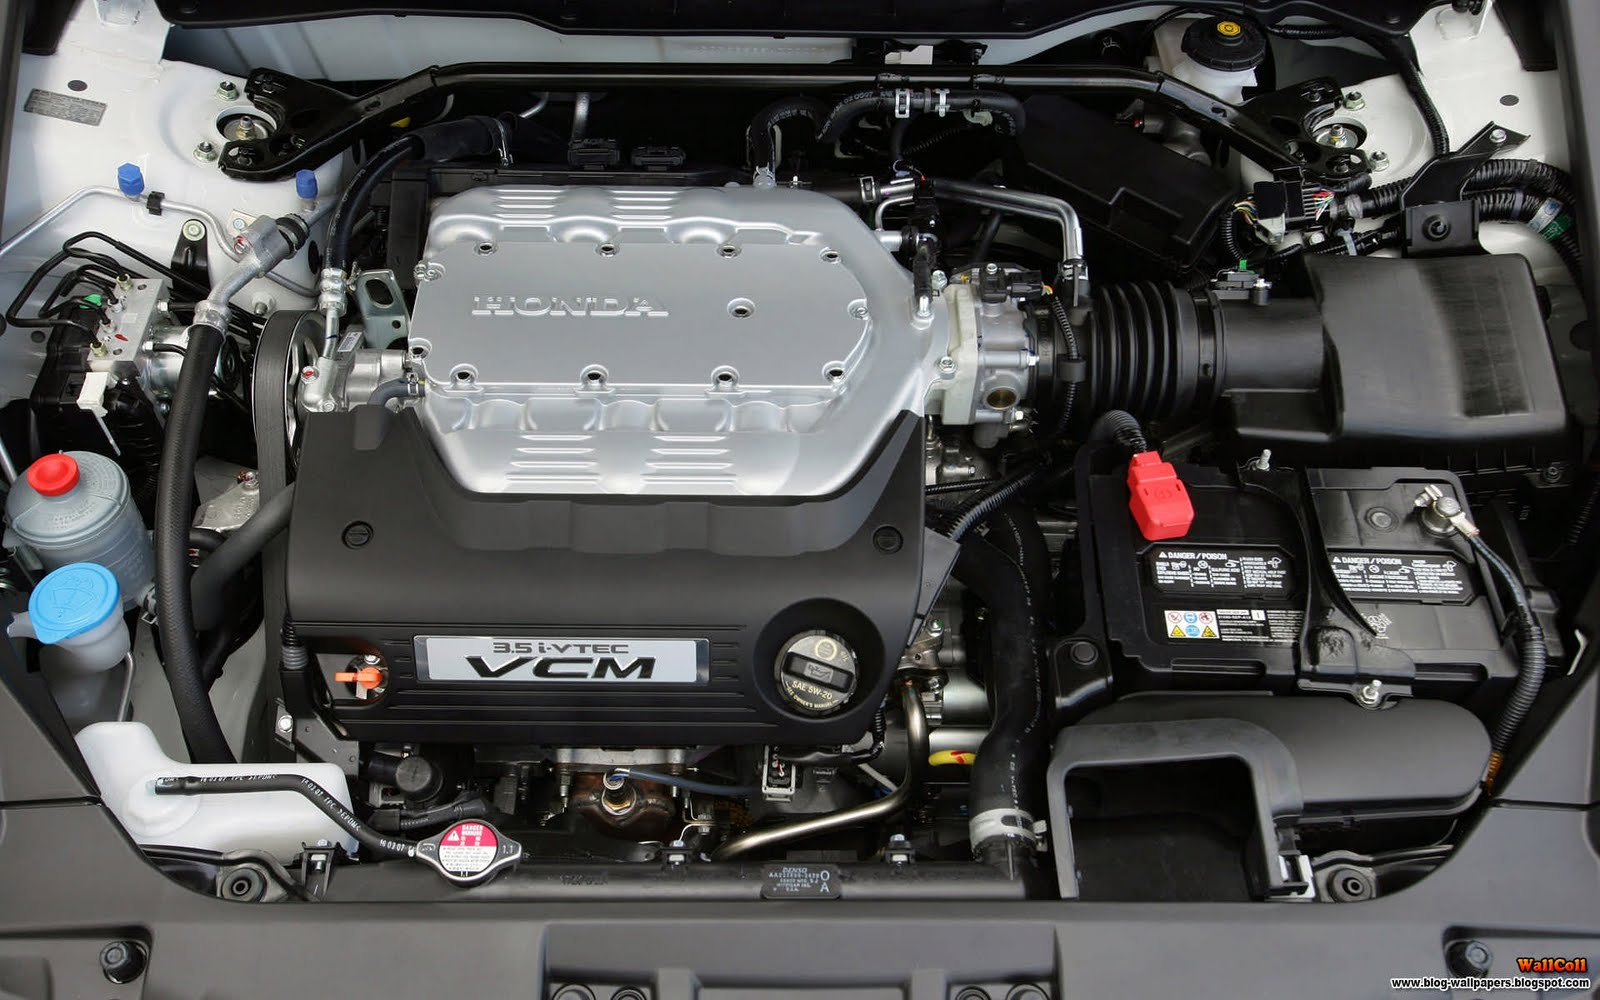 Mechanical engineering car engine - photo#31